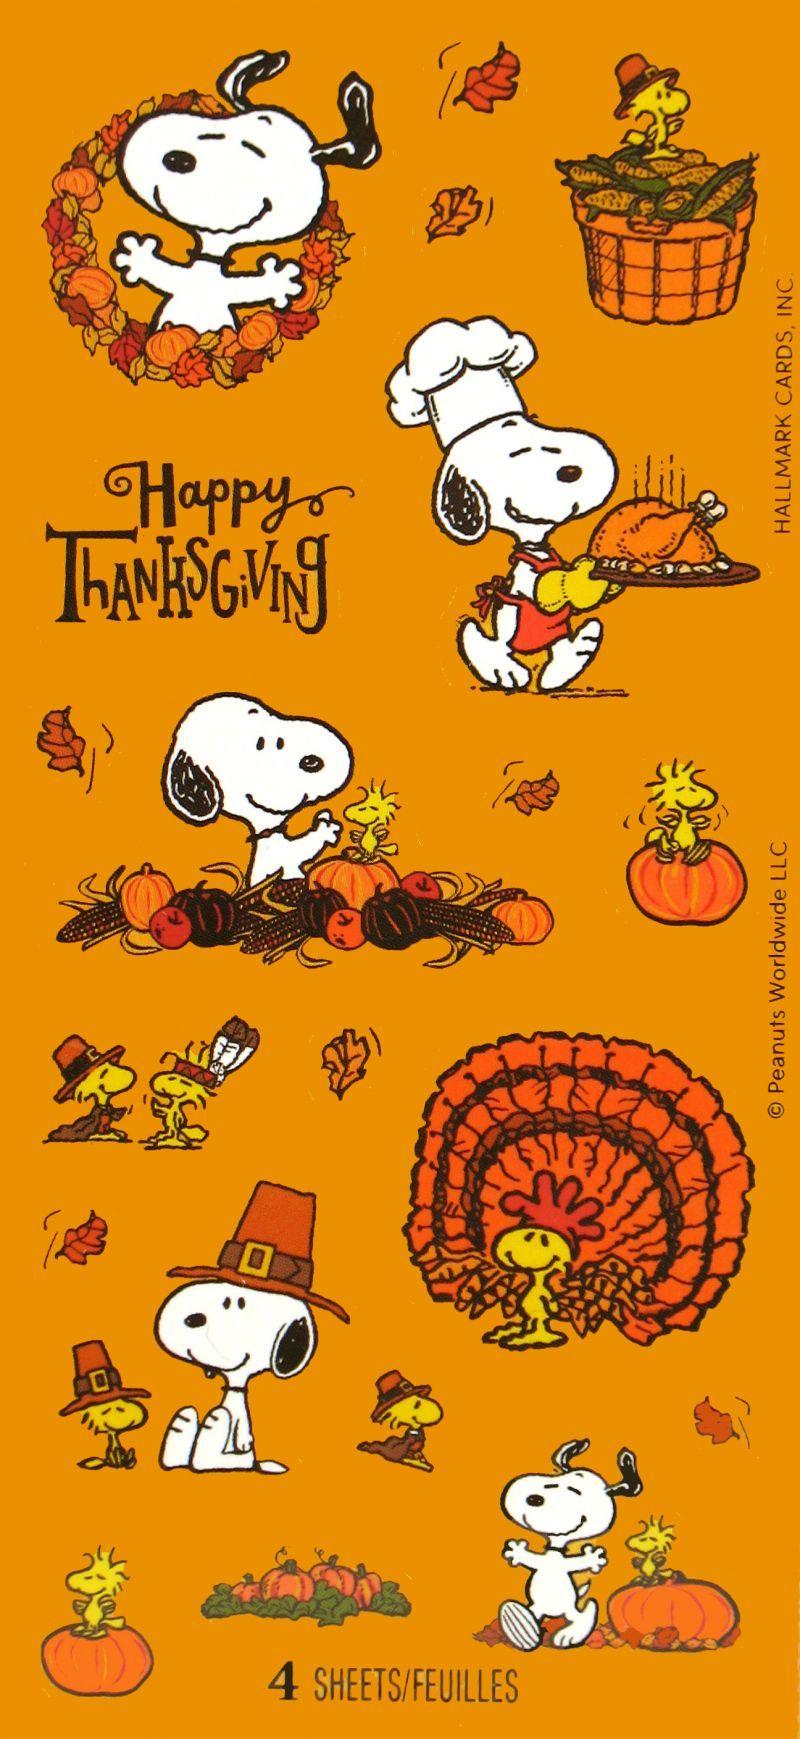 Hmstickers663 Jpg 800 1739 Snoopy Wallpaper Thanksgiving Snoopy Peanuts Wallpaper